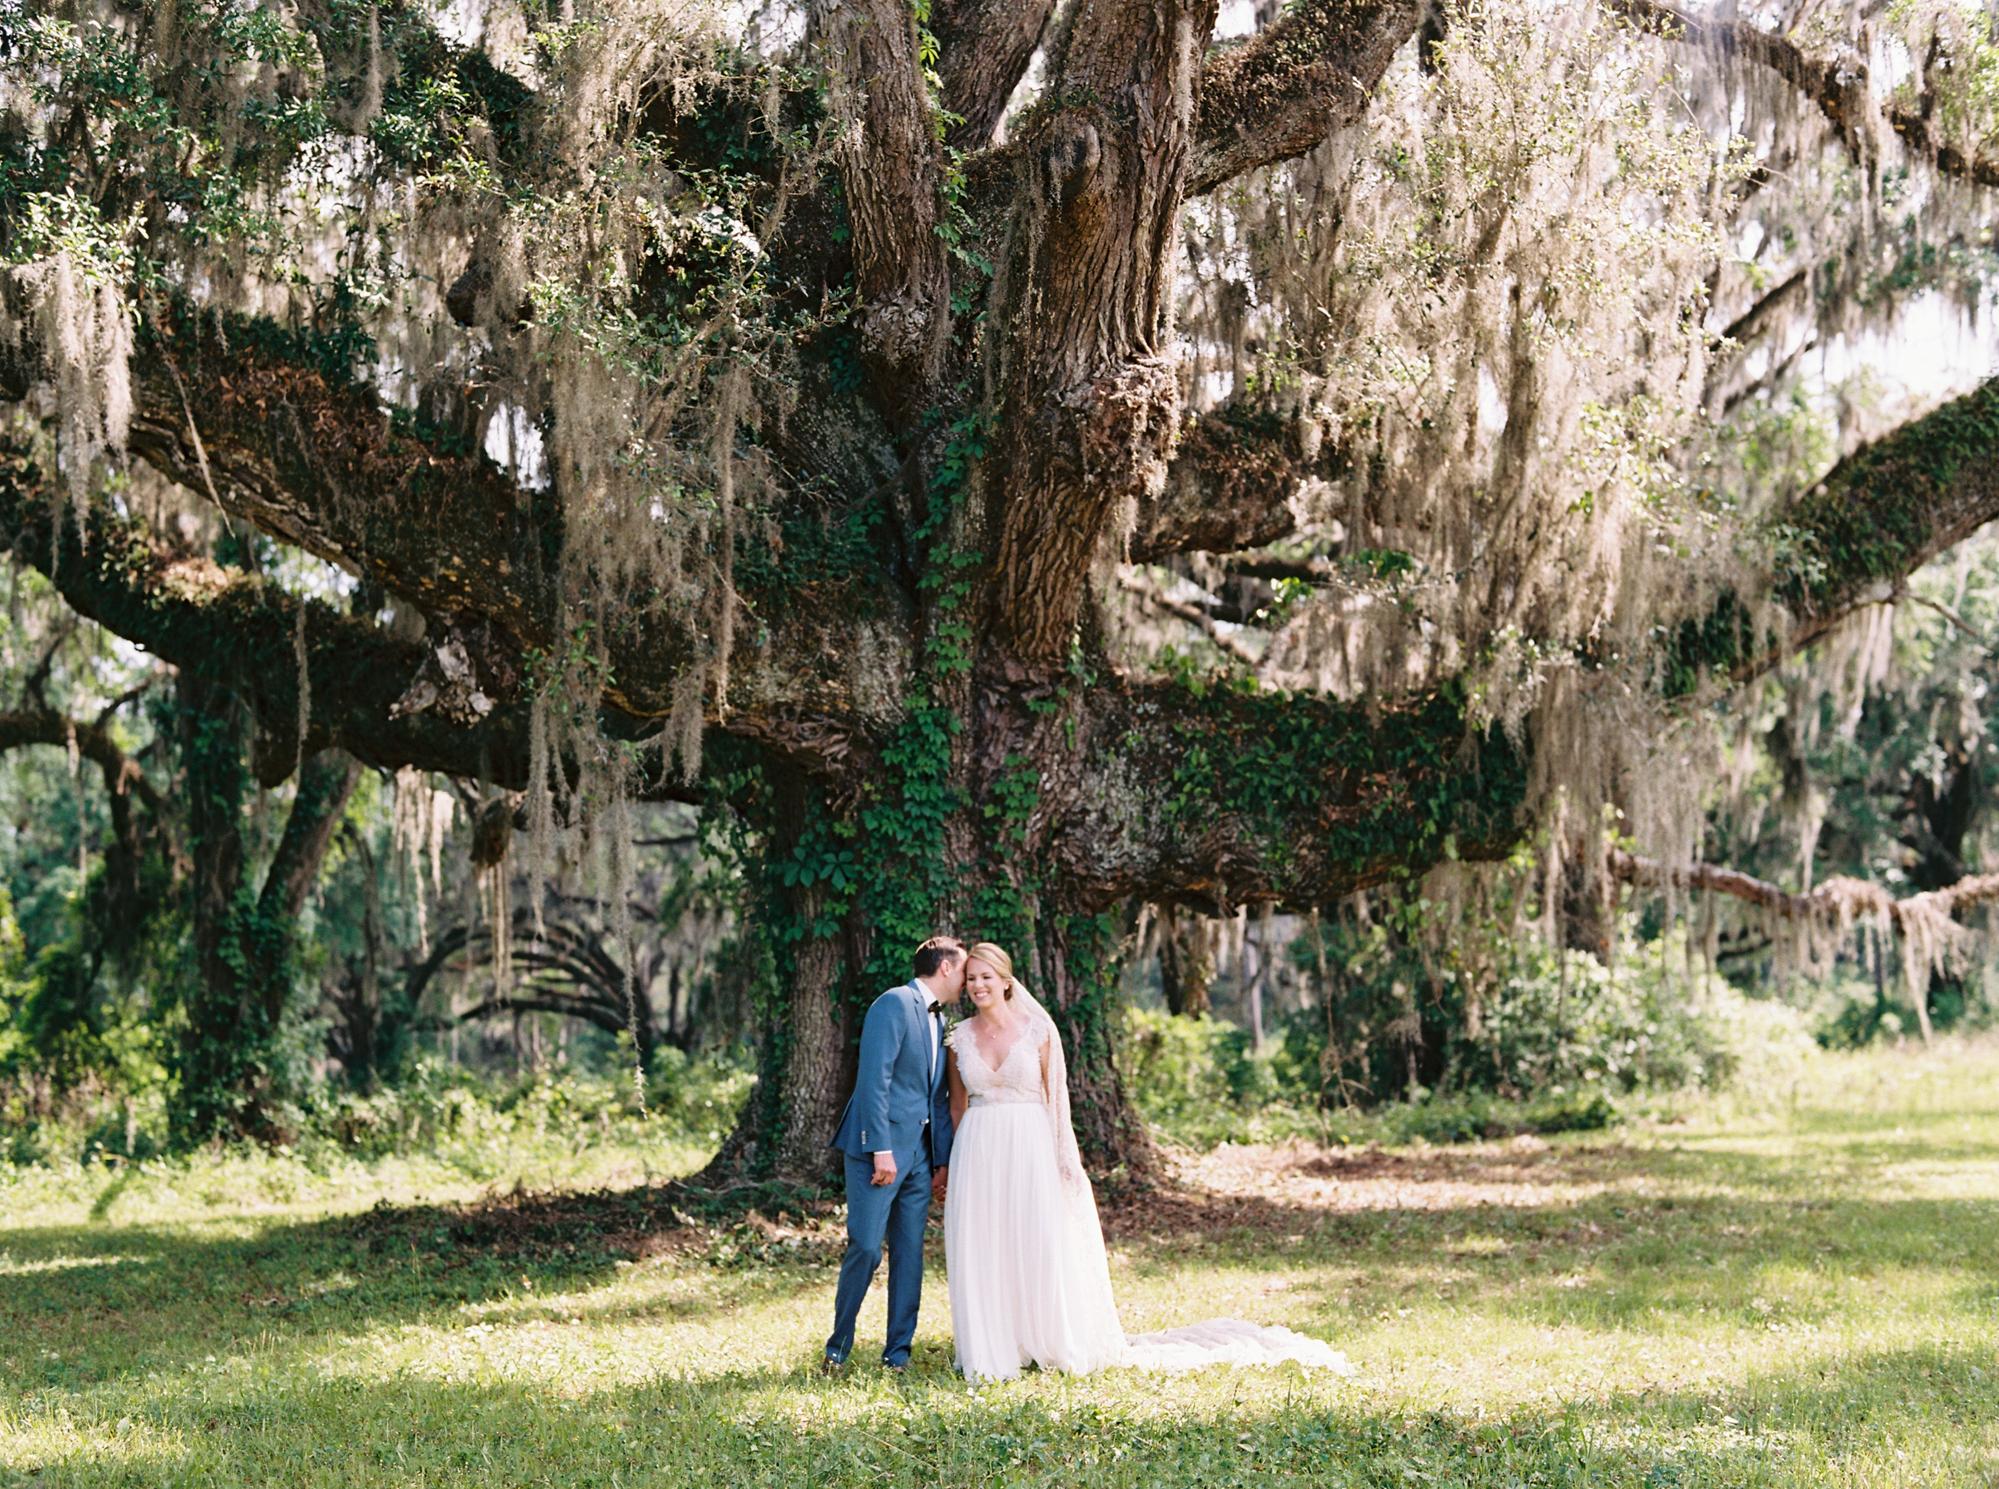 southern-wedding-4.jpg